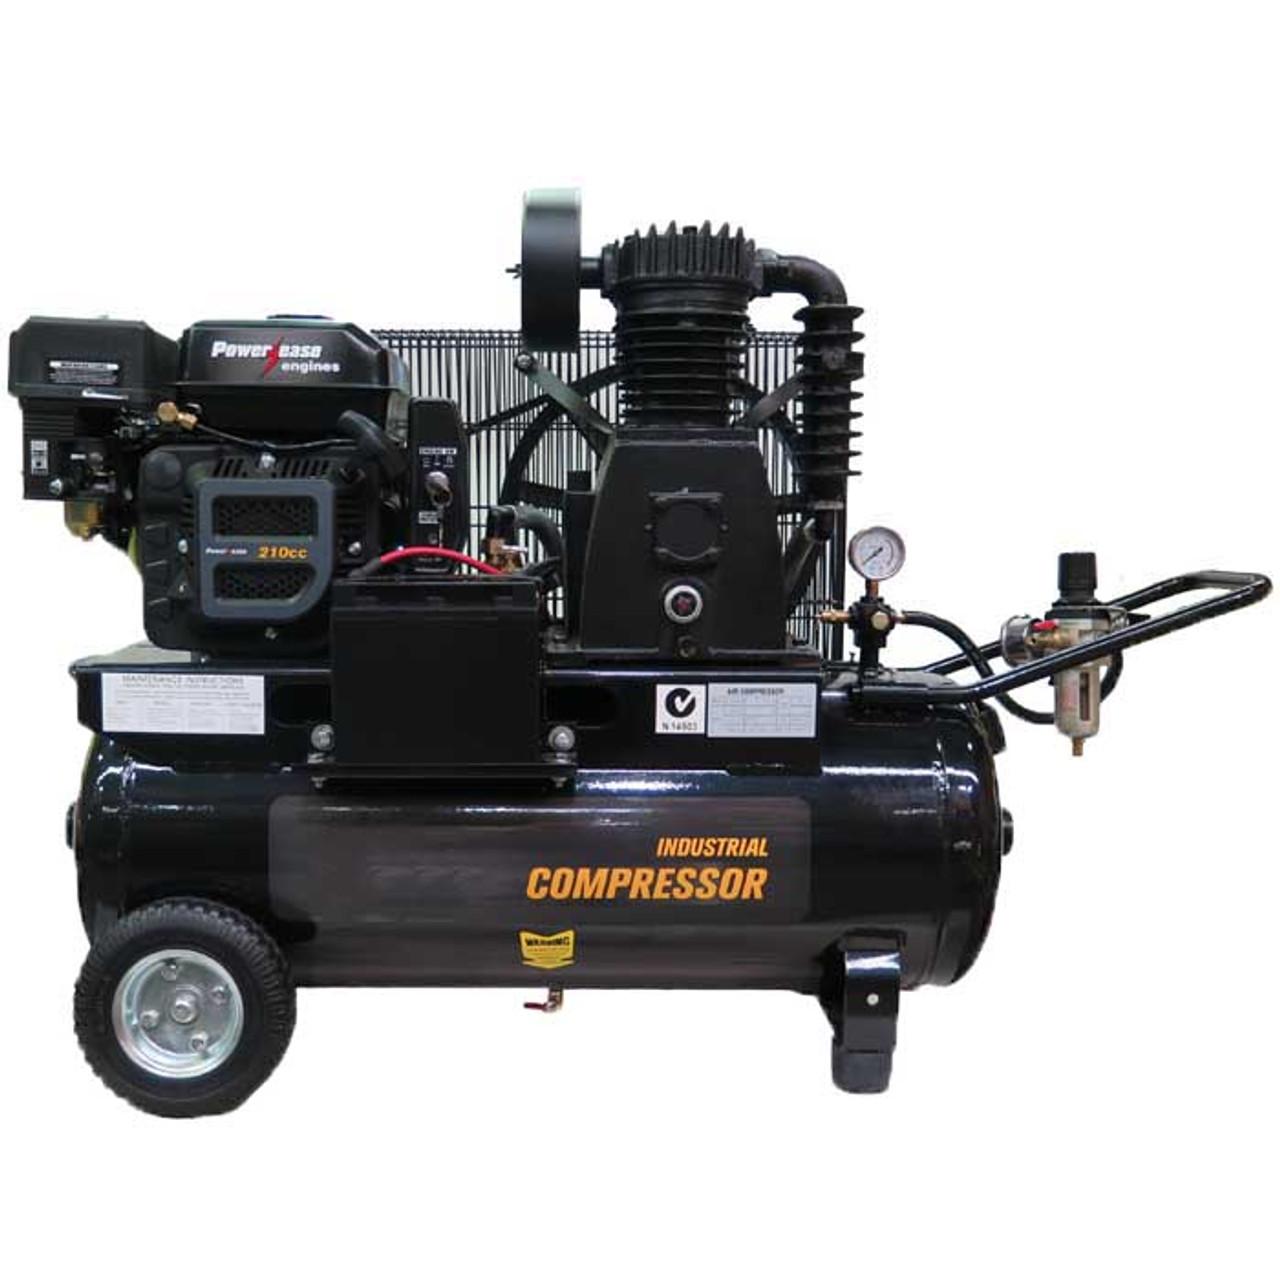 Compressor  70 litre Petrol powered Professional BE